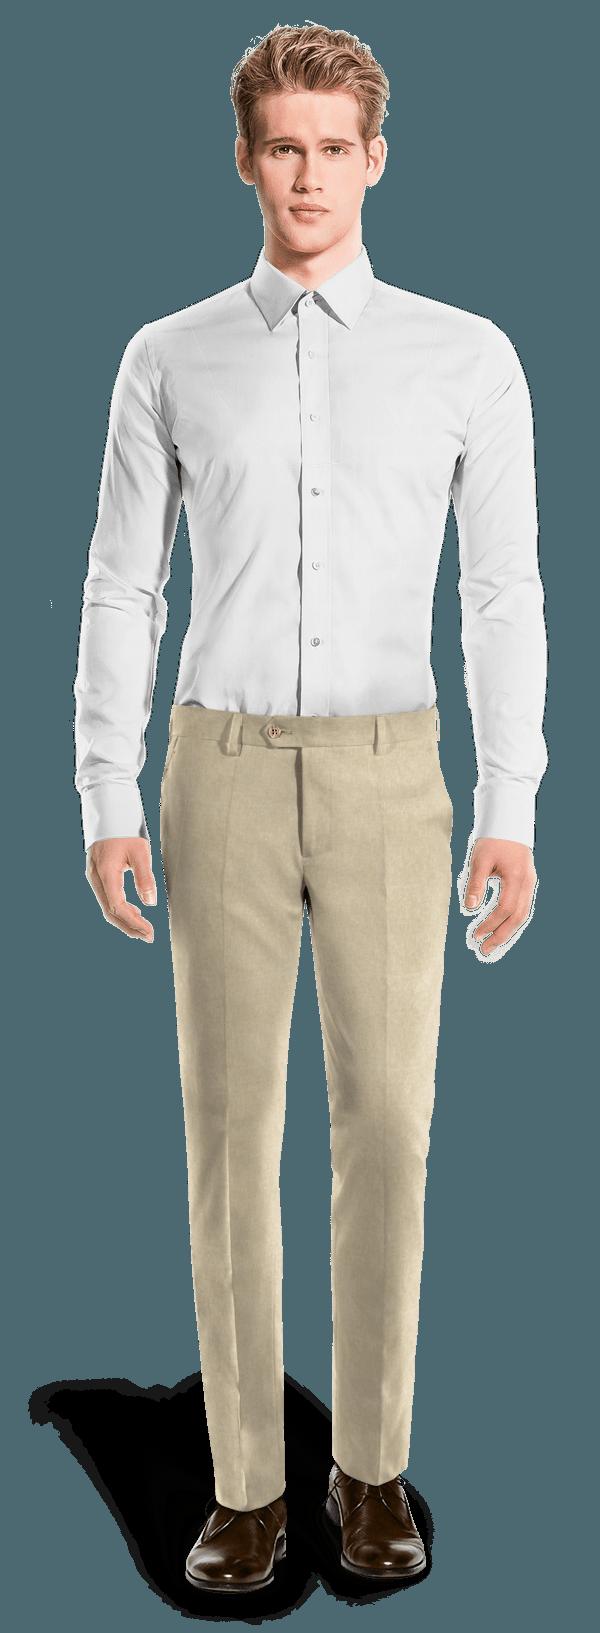 Pantaloni slim fit beige di Lino